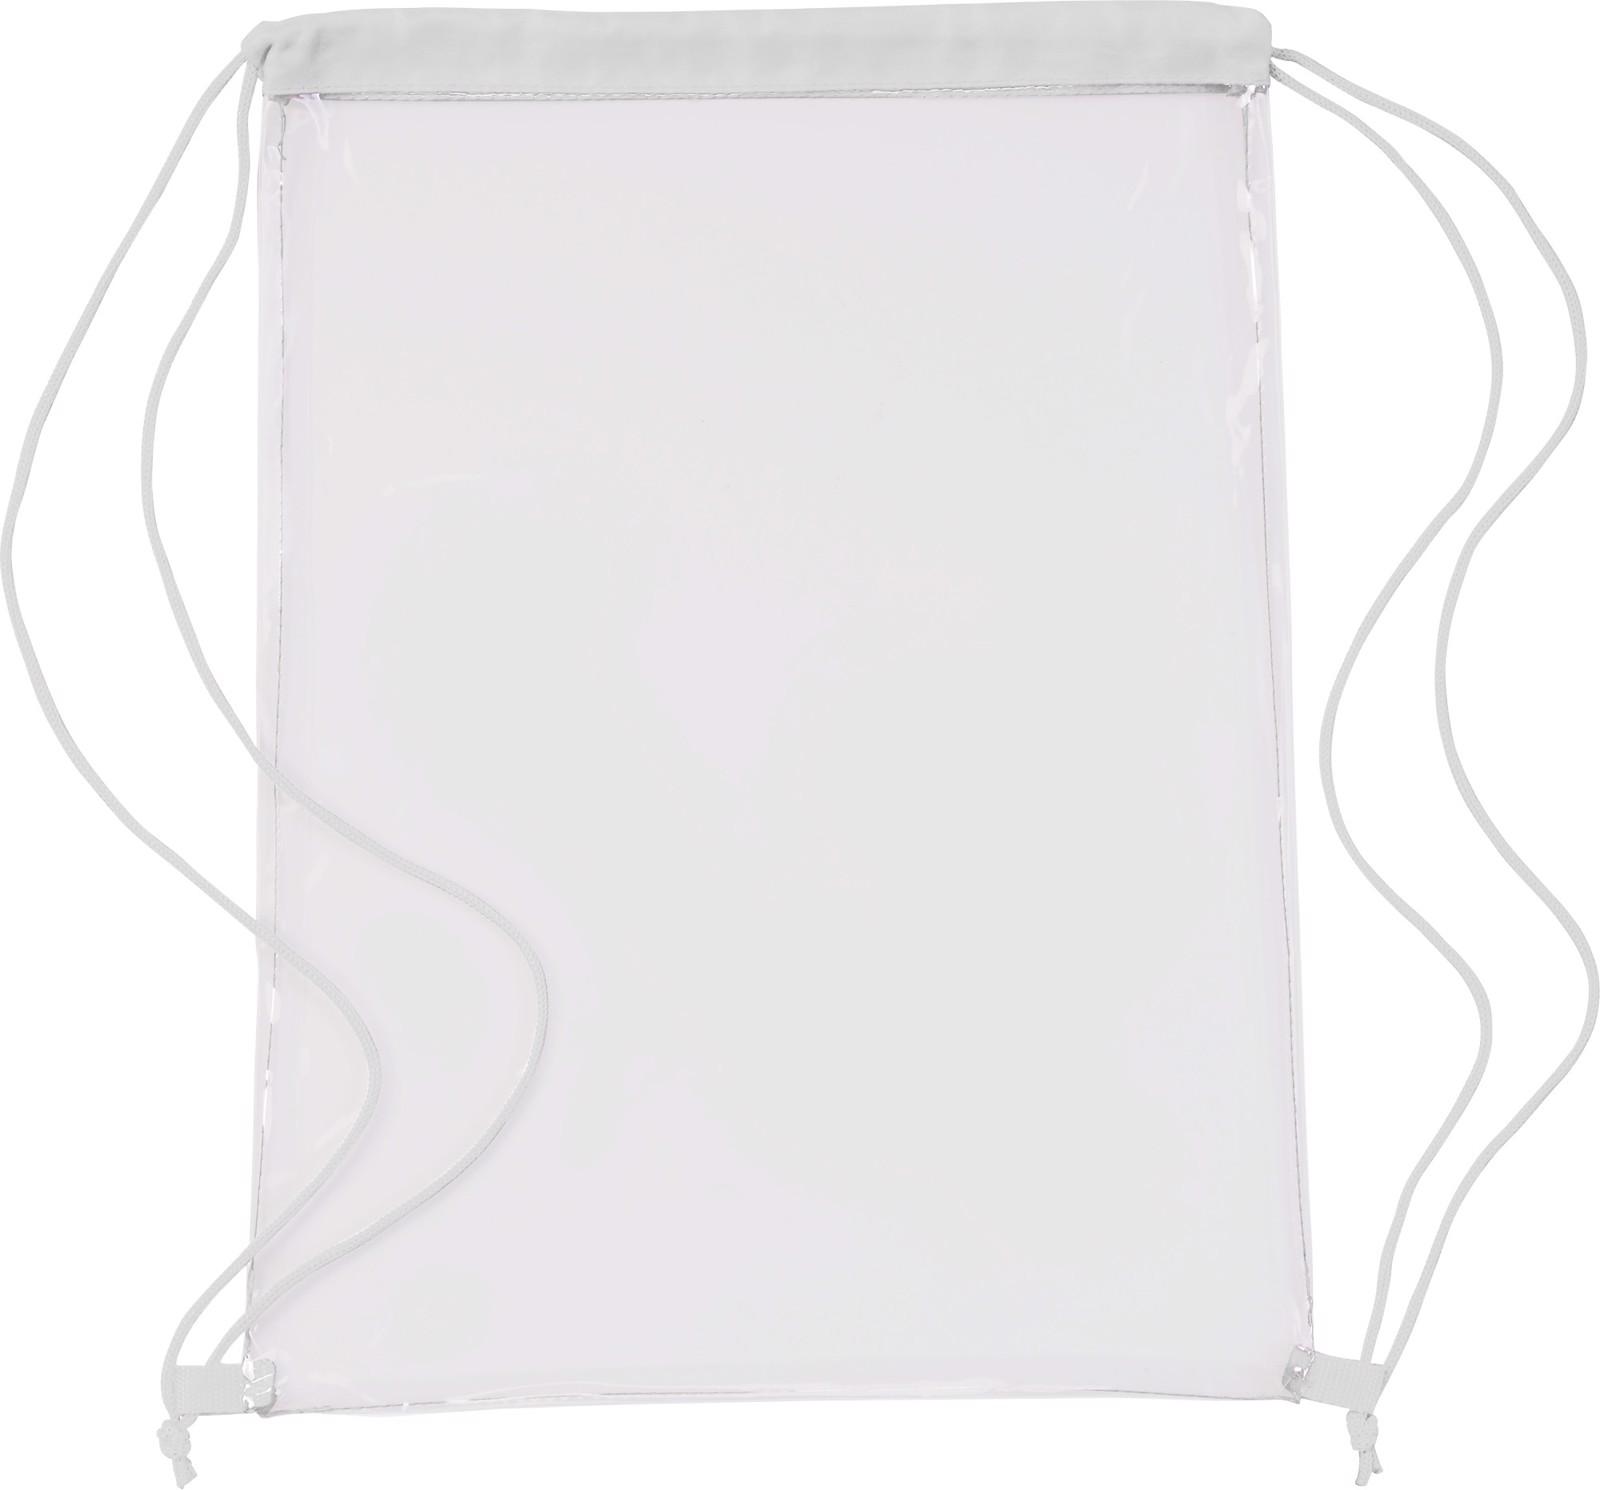 PVC drawstring backpack - White